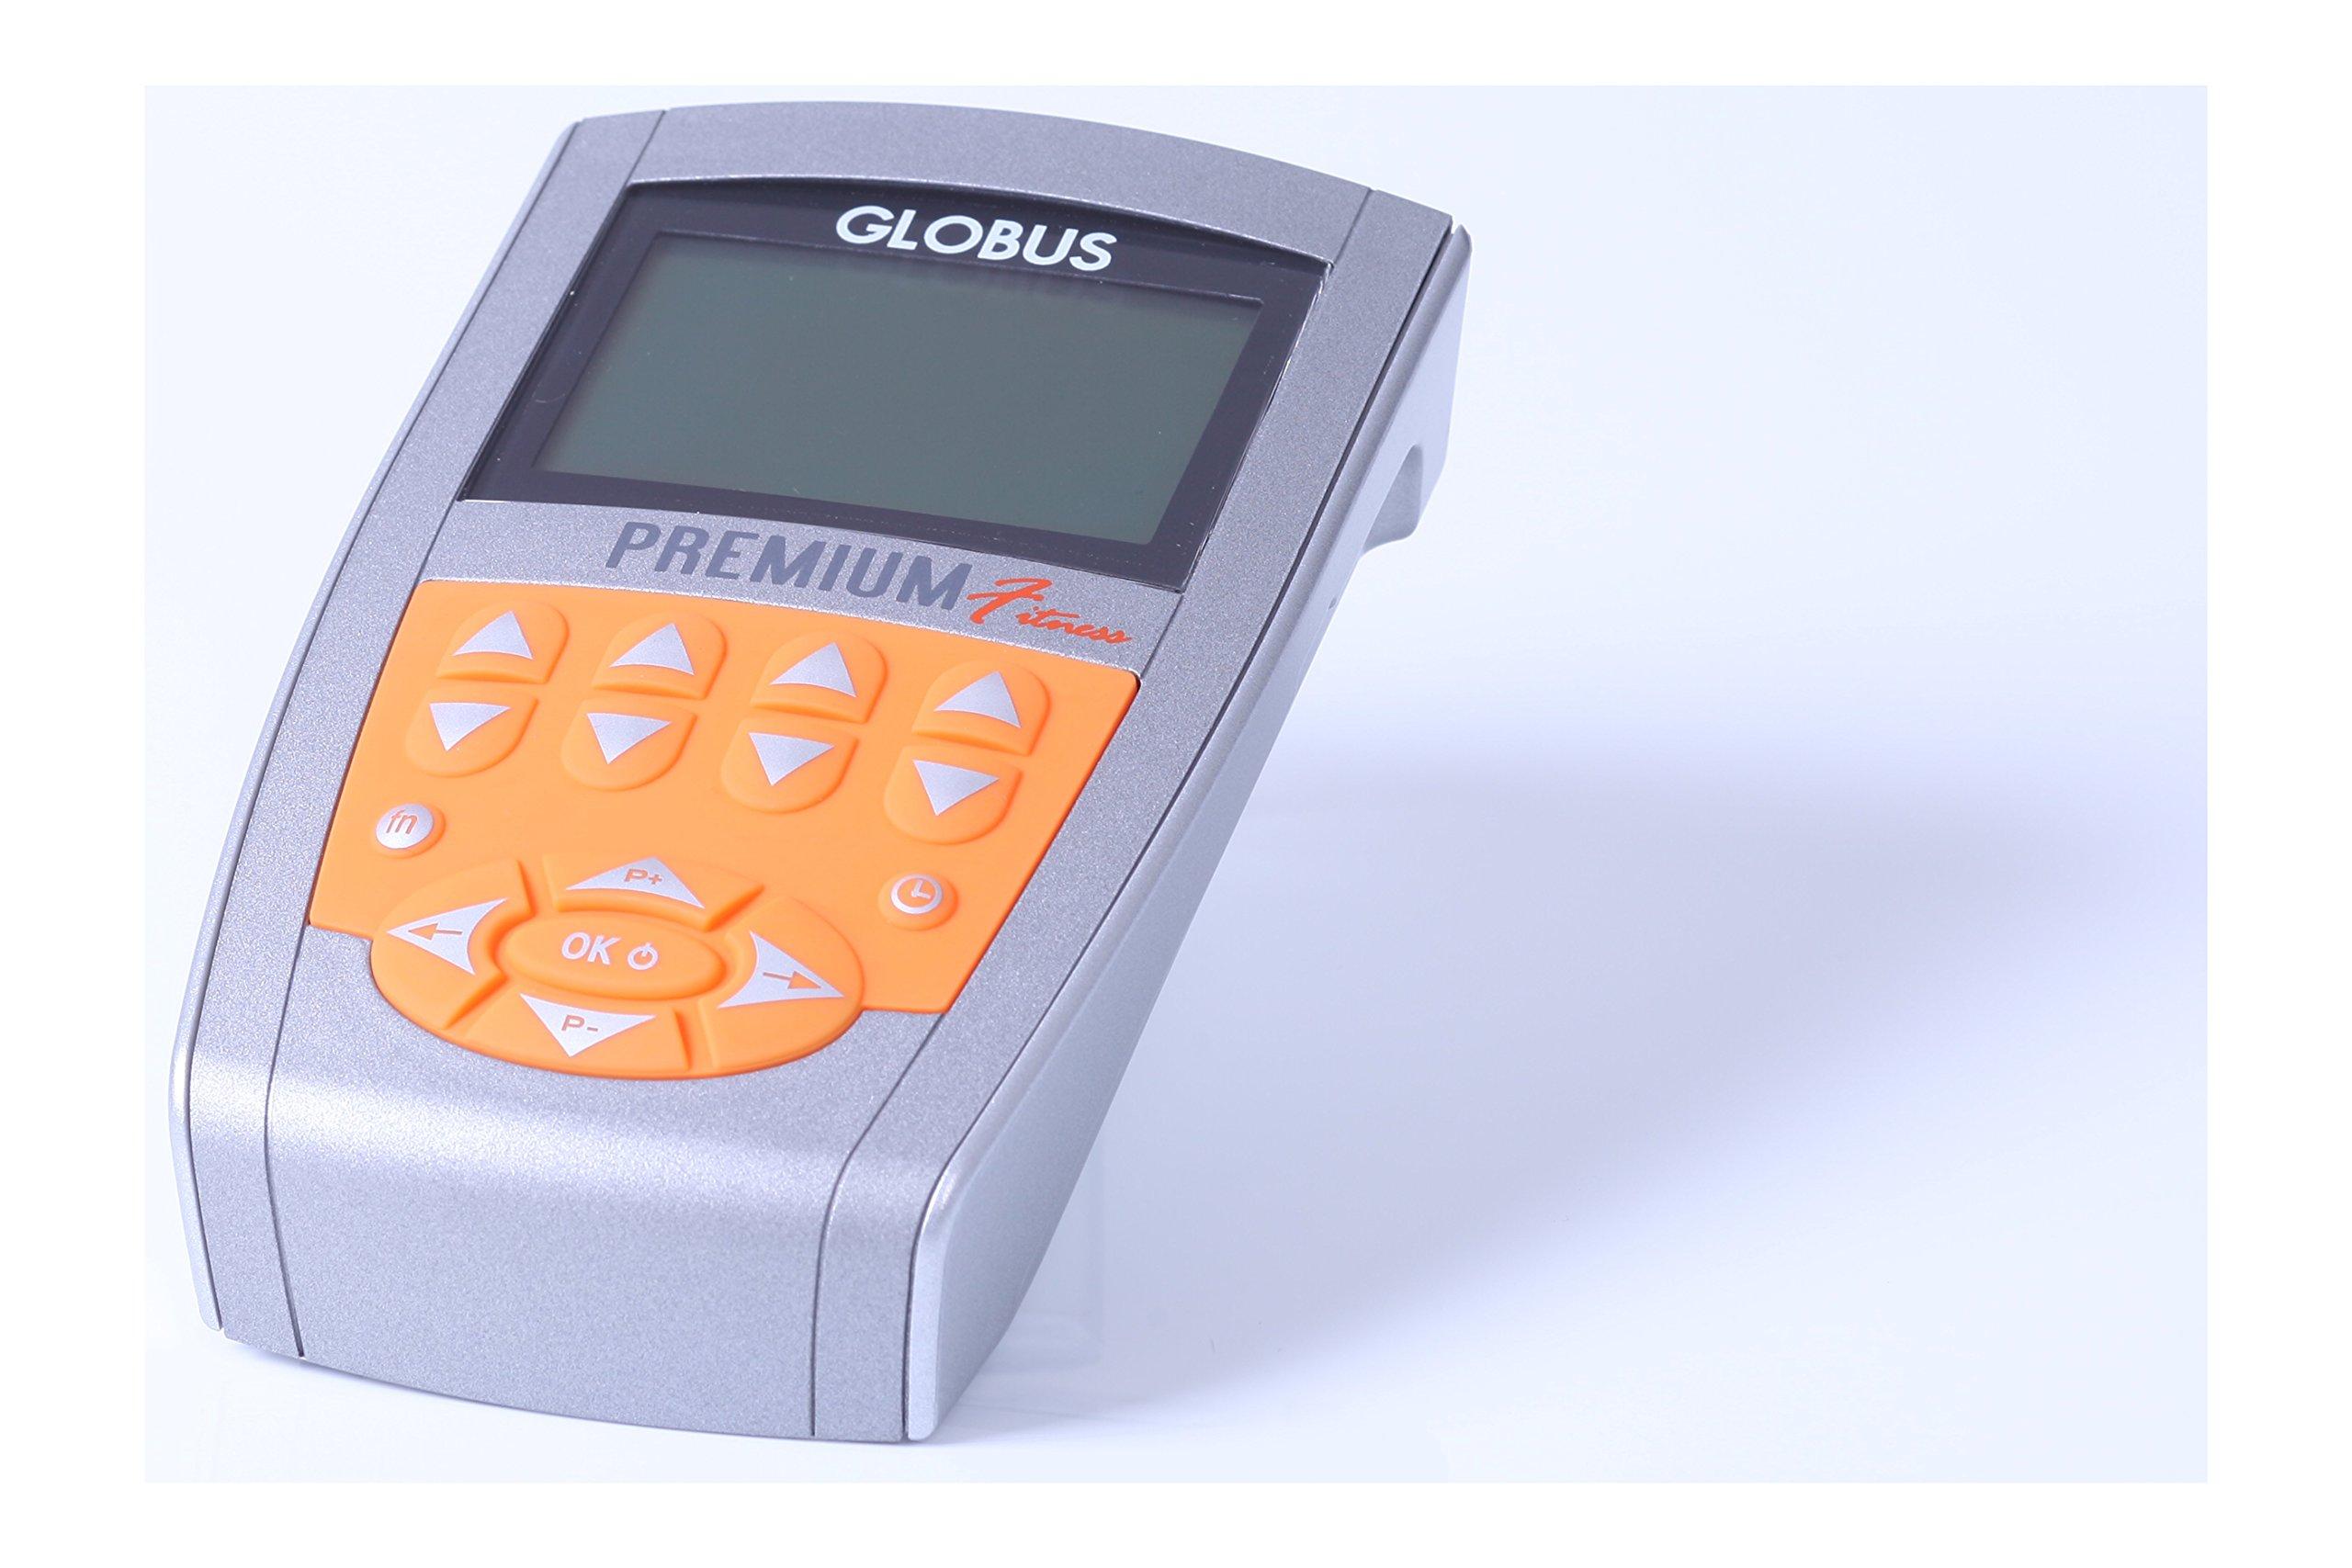 Globus Premium Fitness Electrostimulator by Globus